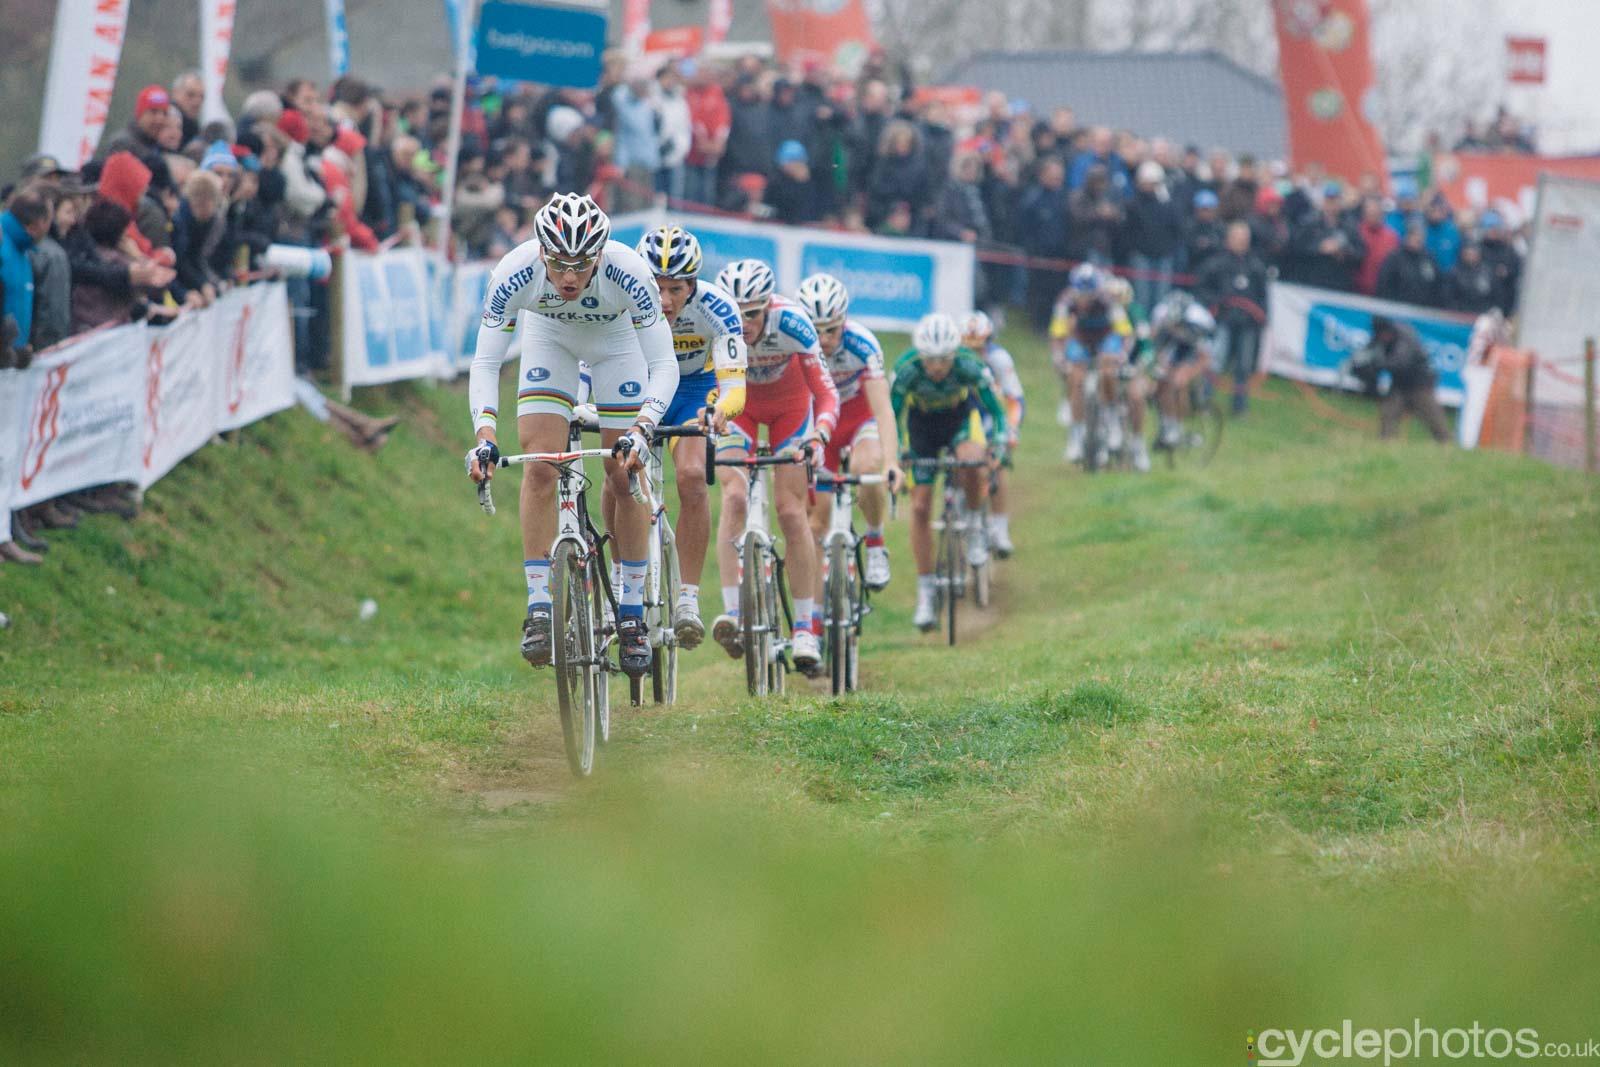 2015-cyclephotos-cyclocross-ronse-151223-zdenek-stybar